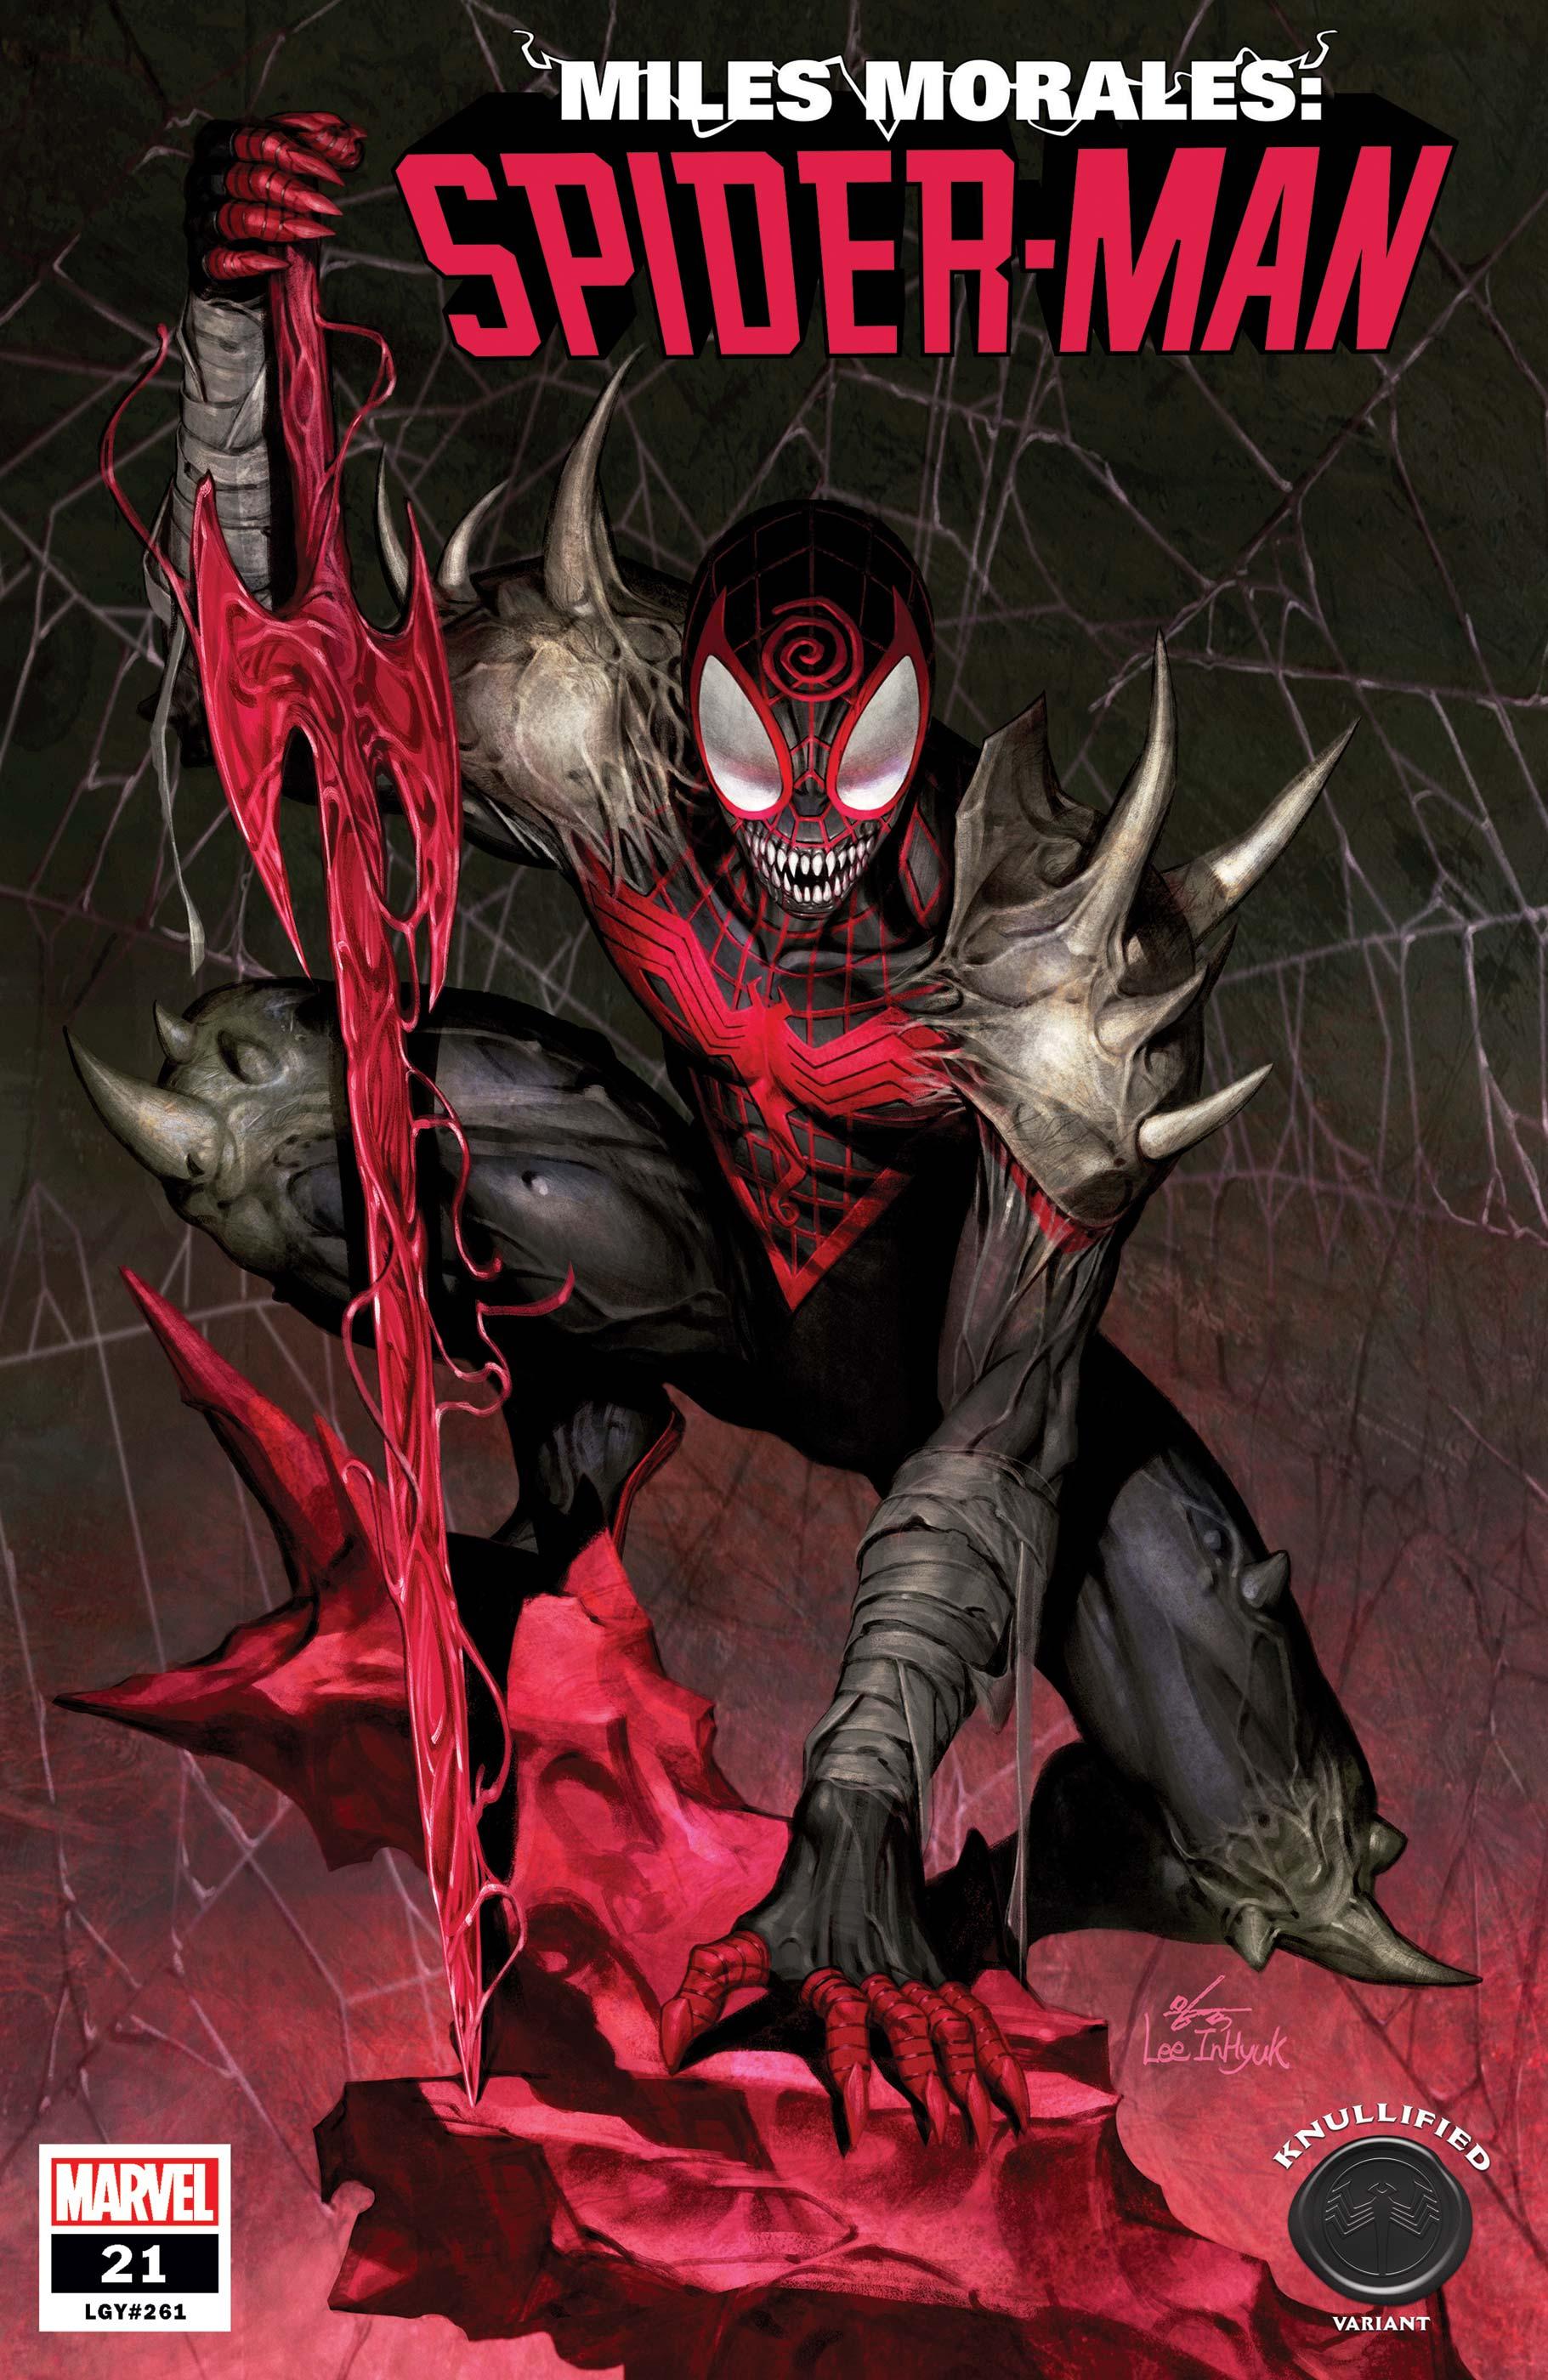 Miles Morales: Spider-Man (2018) #21 (Variant)